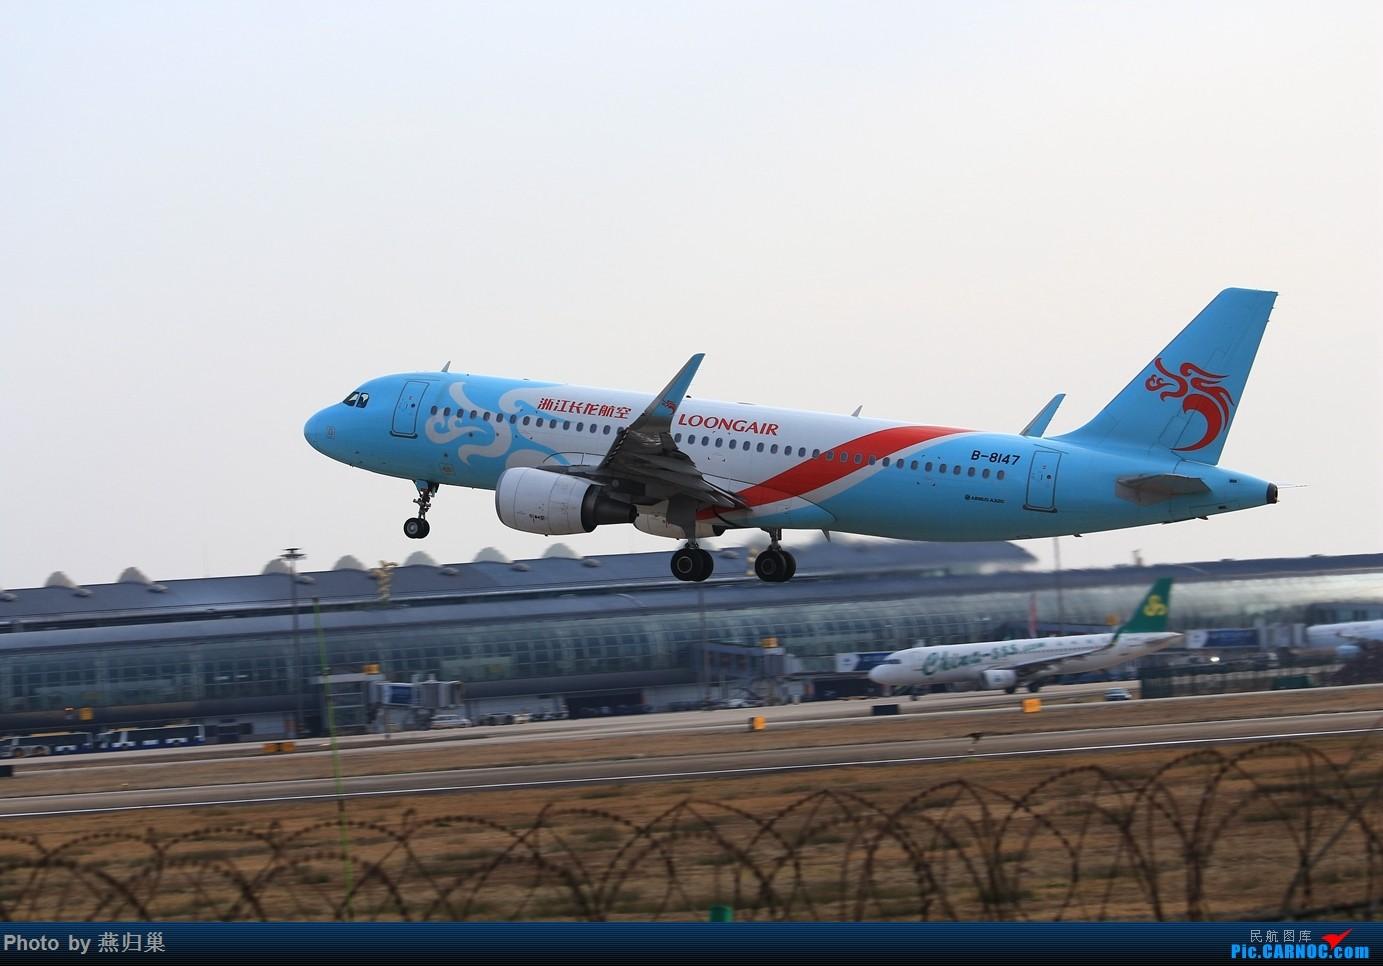 Re:[原创]【宁波飞友会】年前NGB拍机合集 AIRBUS A320-200 B-8147 中国宁波栎社国际机场